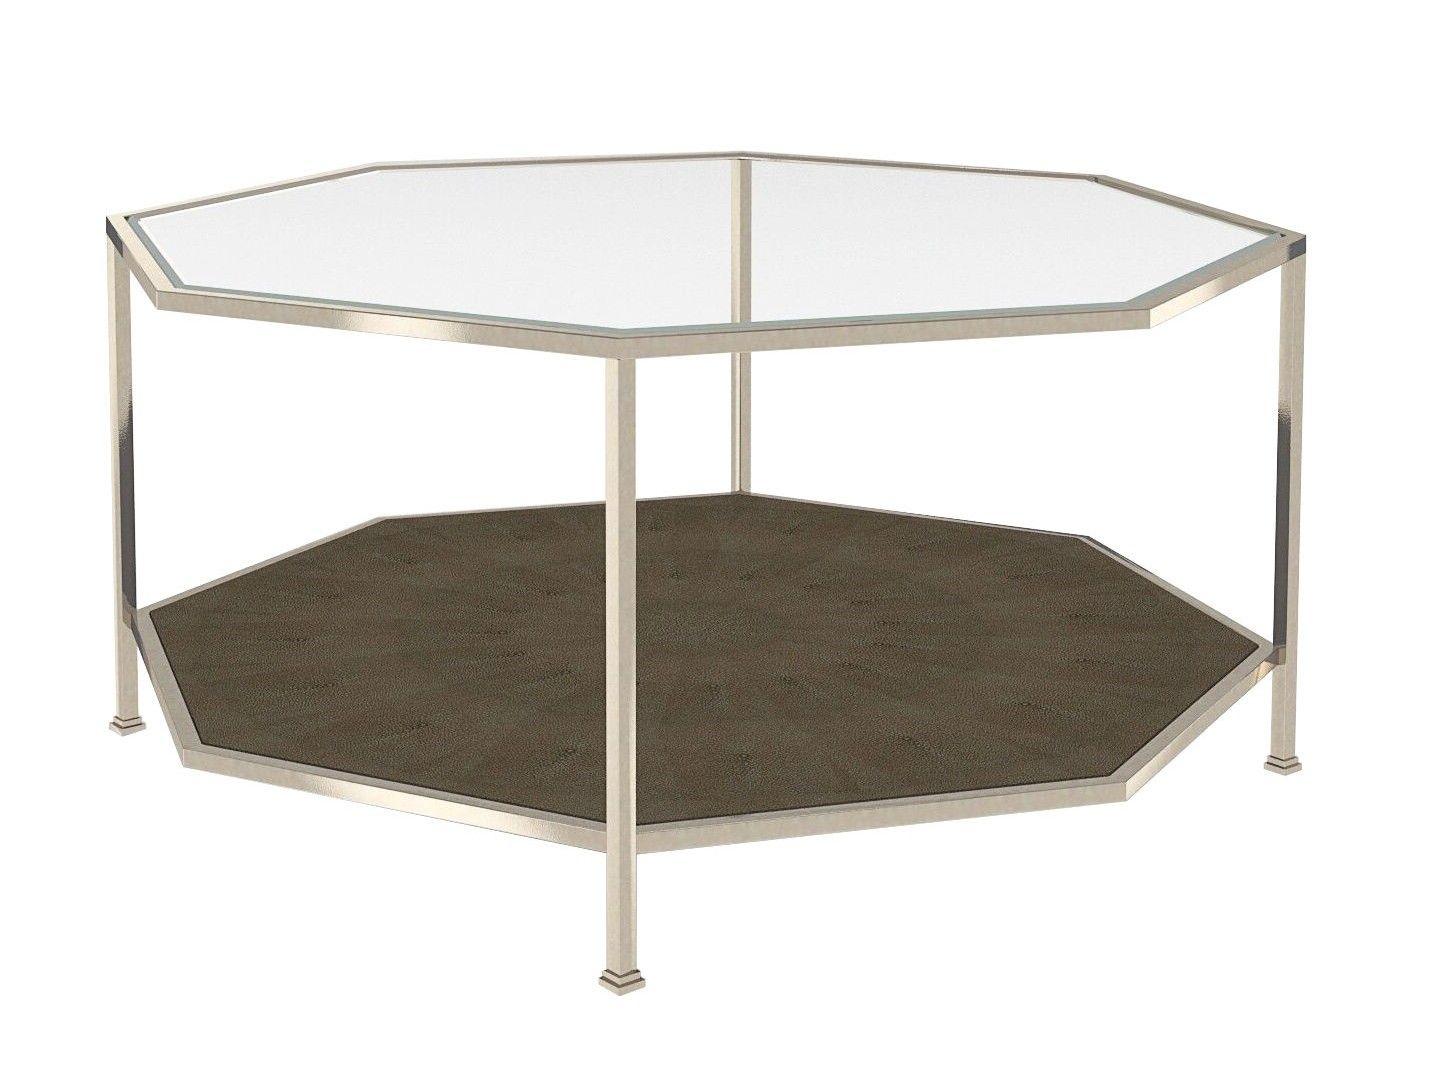 Hexagonal Coffee Table Polished Nickel Charcoal Coffee Table Hexagon Coffee Table Table [ 1079 x 1438 Pixel ]